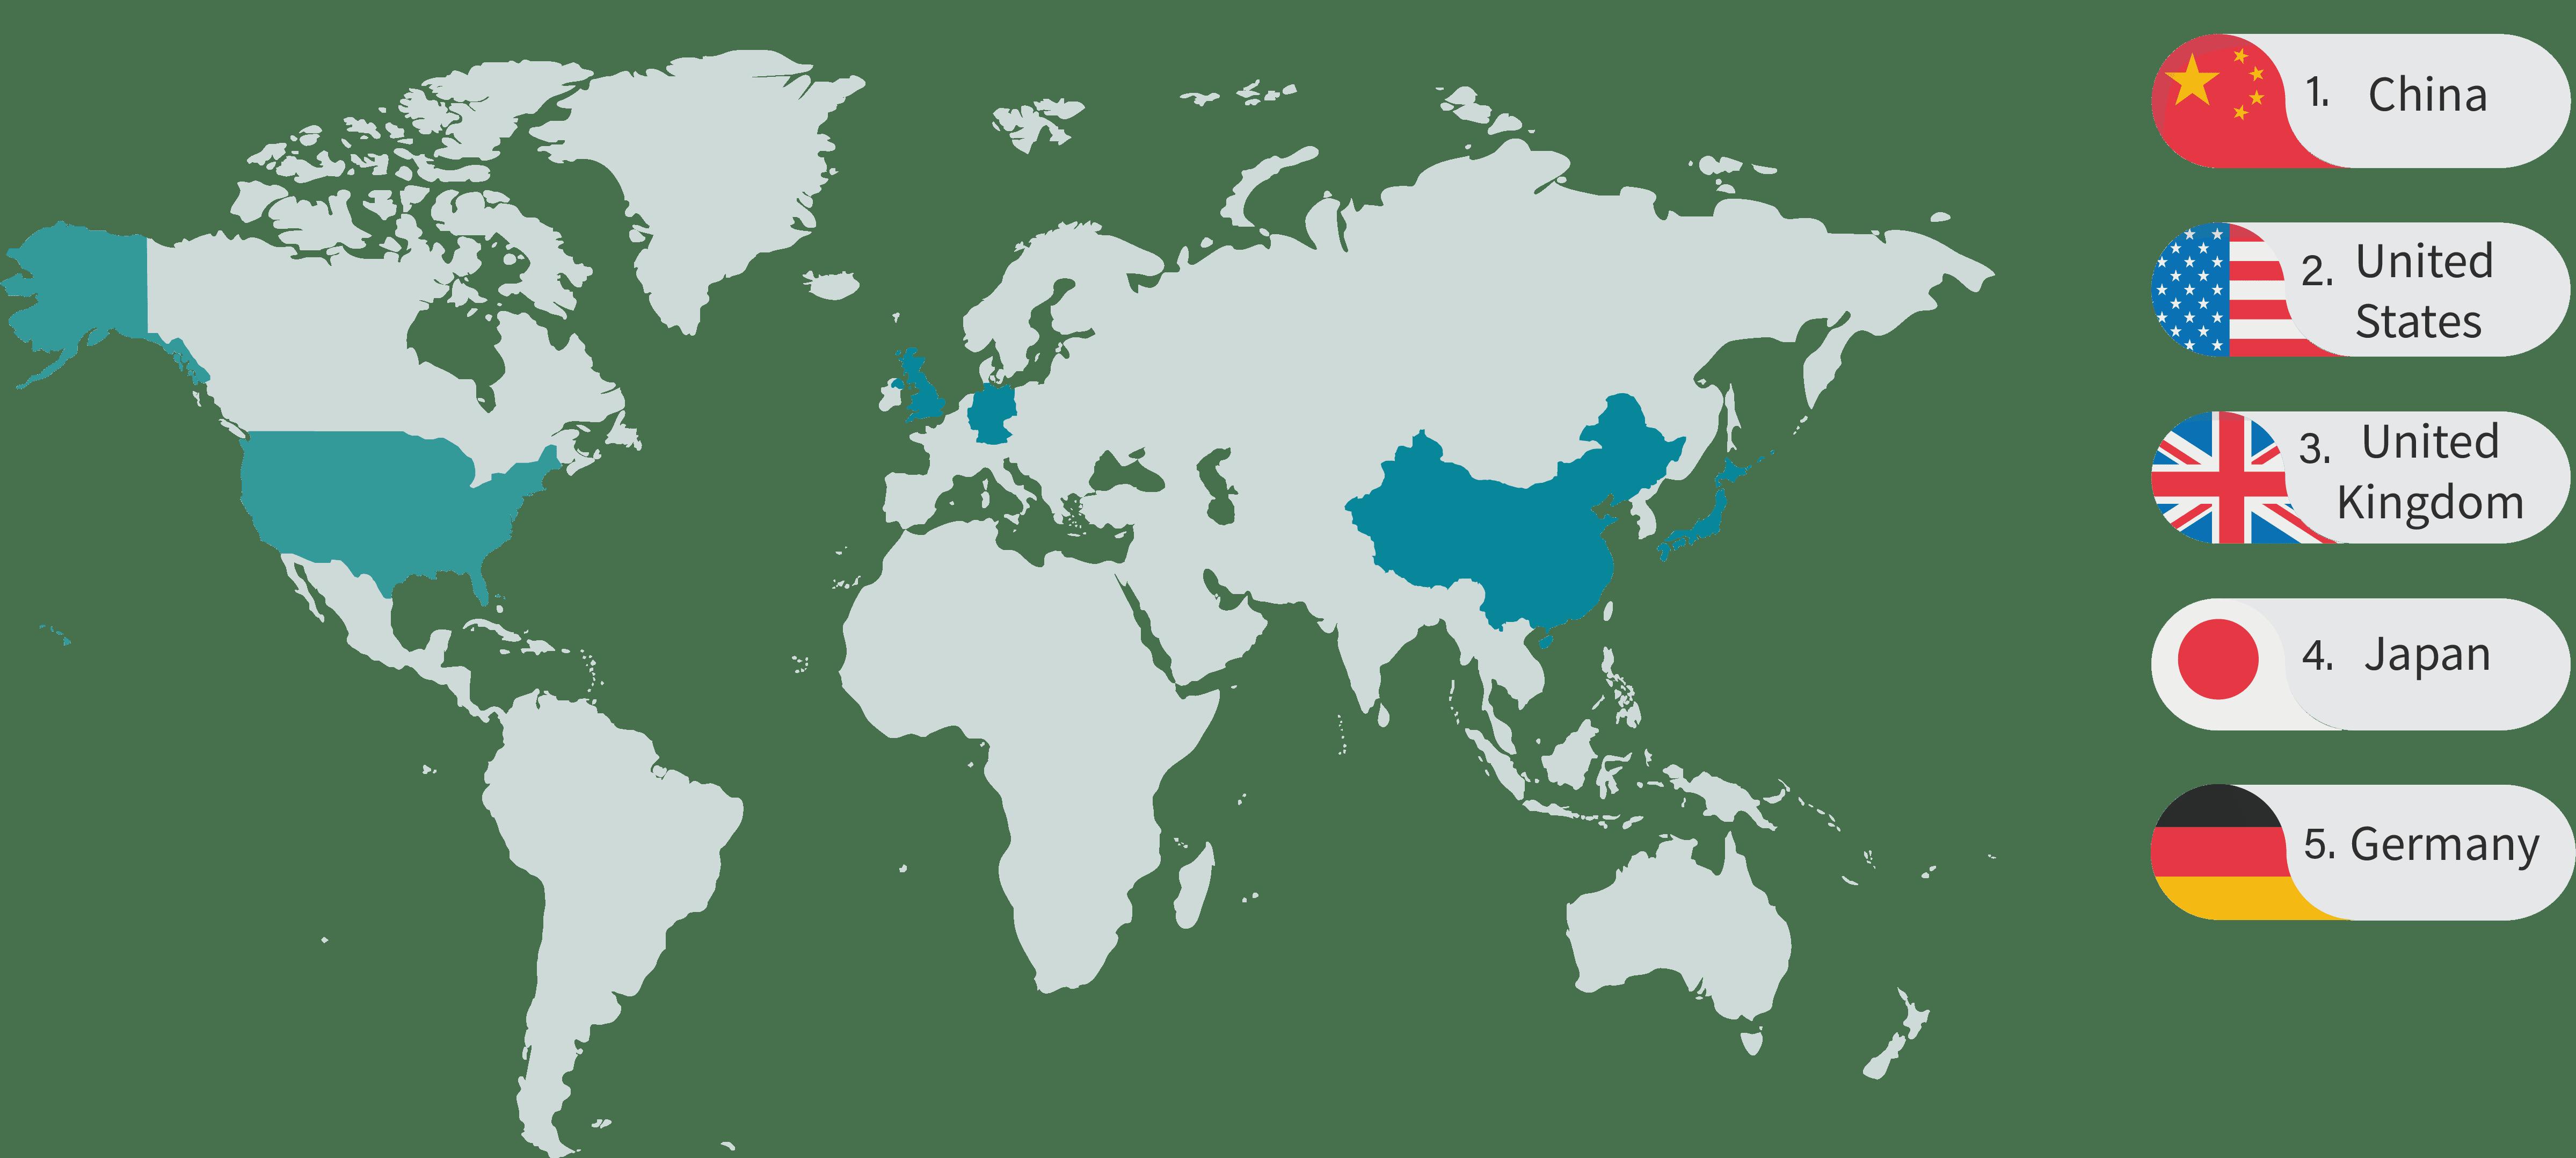 Global eCommerce Landscape